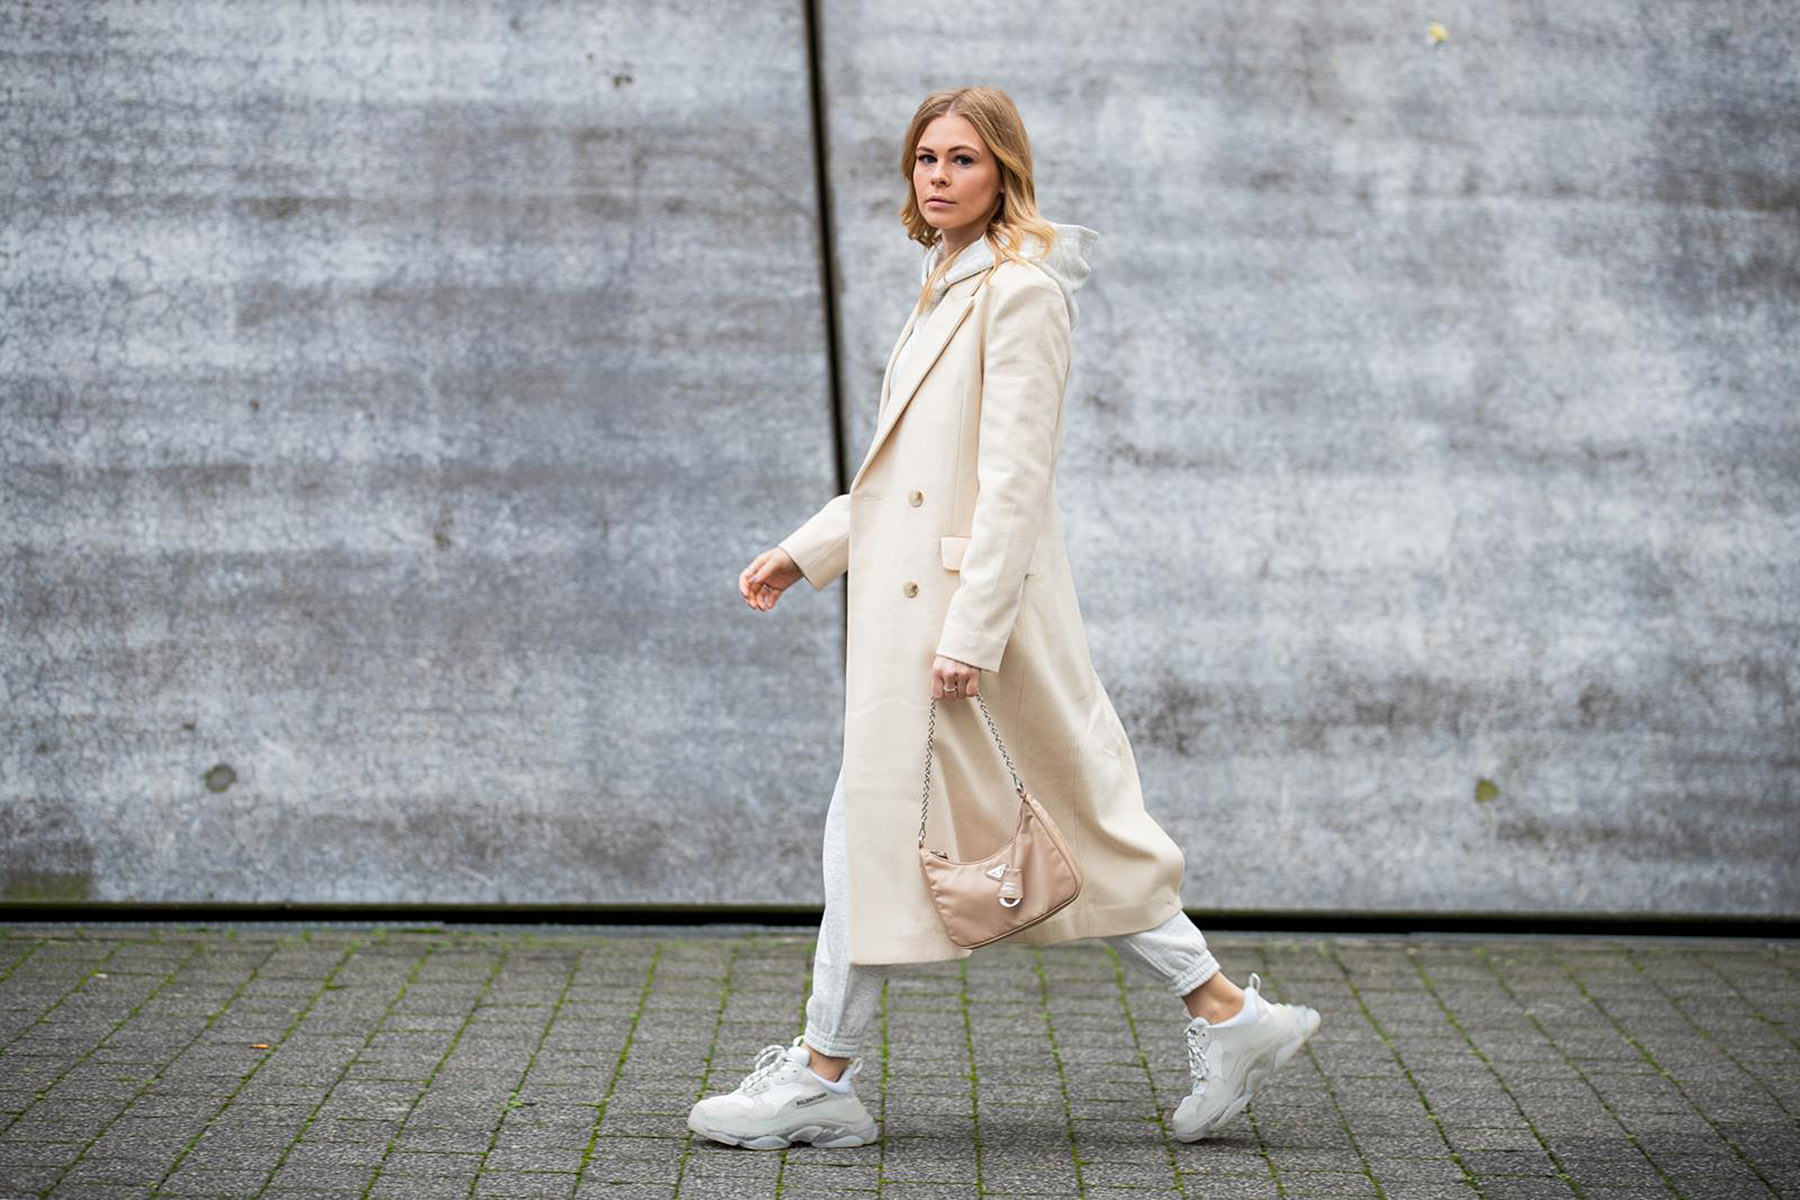 mantel weiss outfit winter inga brauer blog